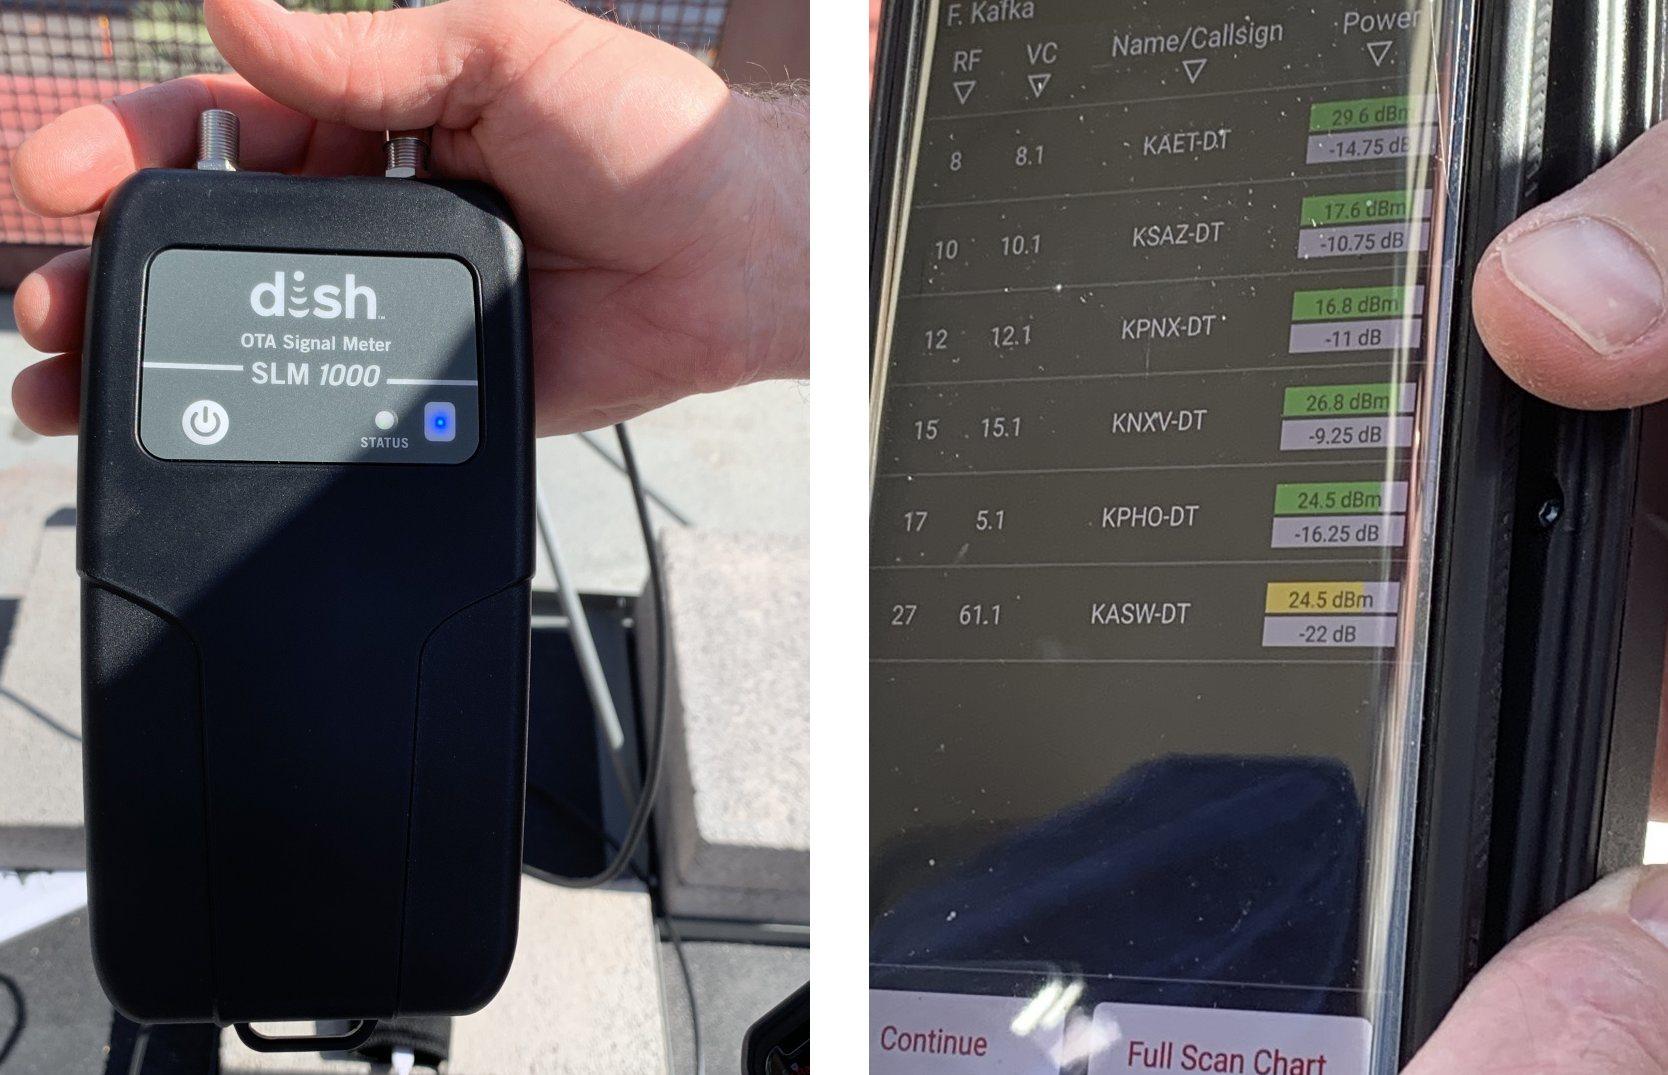 DISH OTA Signal Meter To Improve Antenna Reception